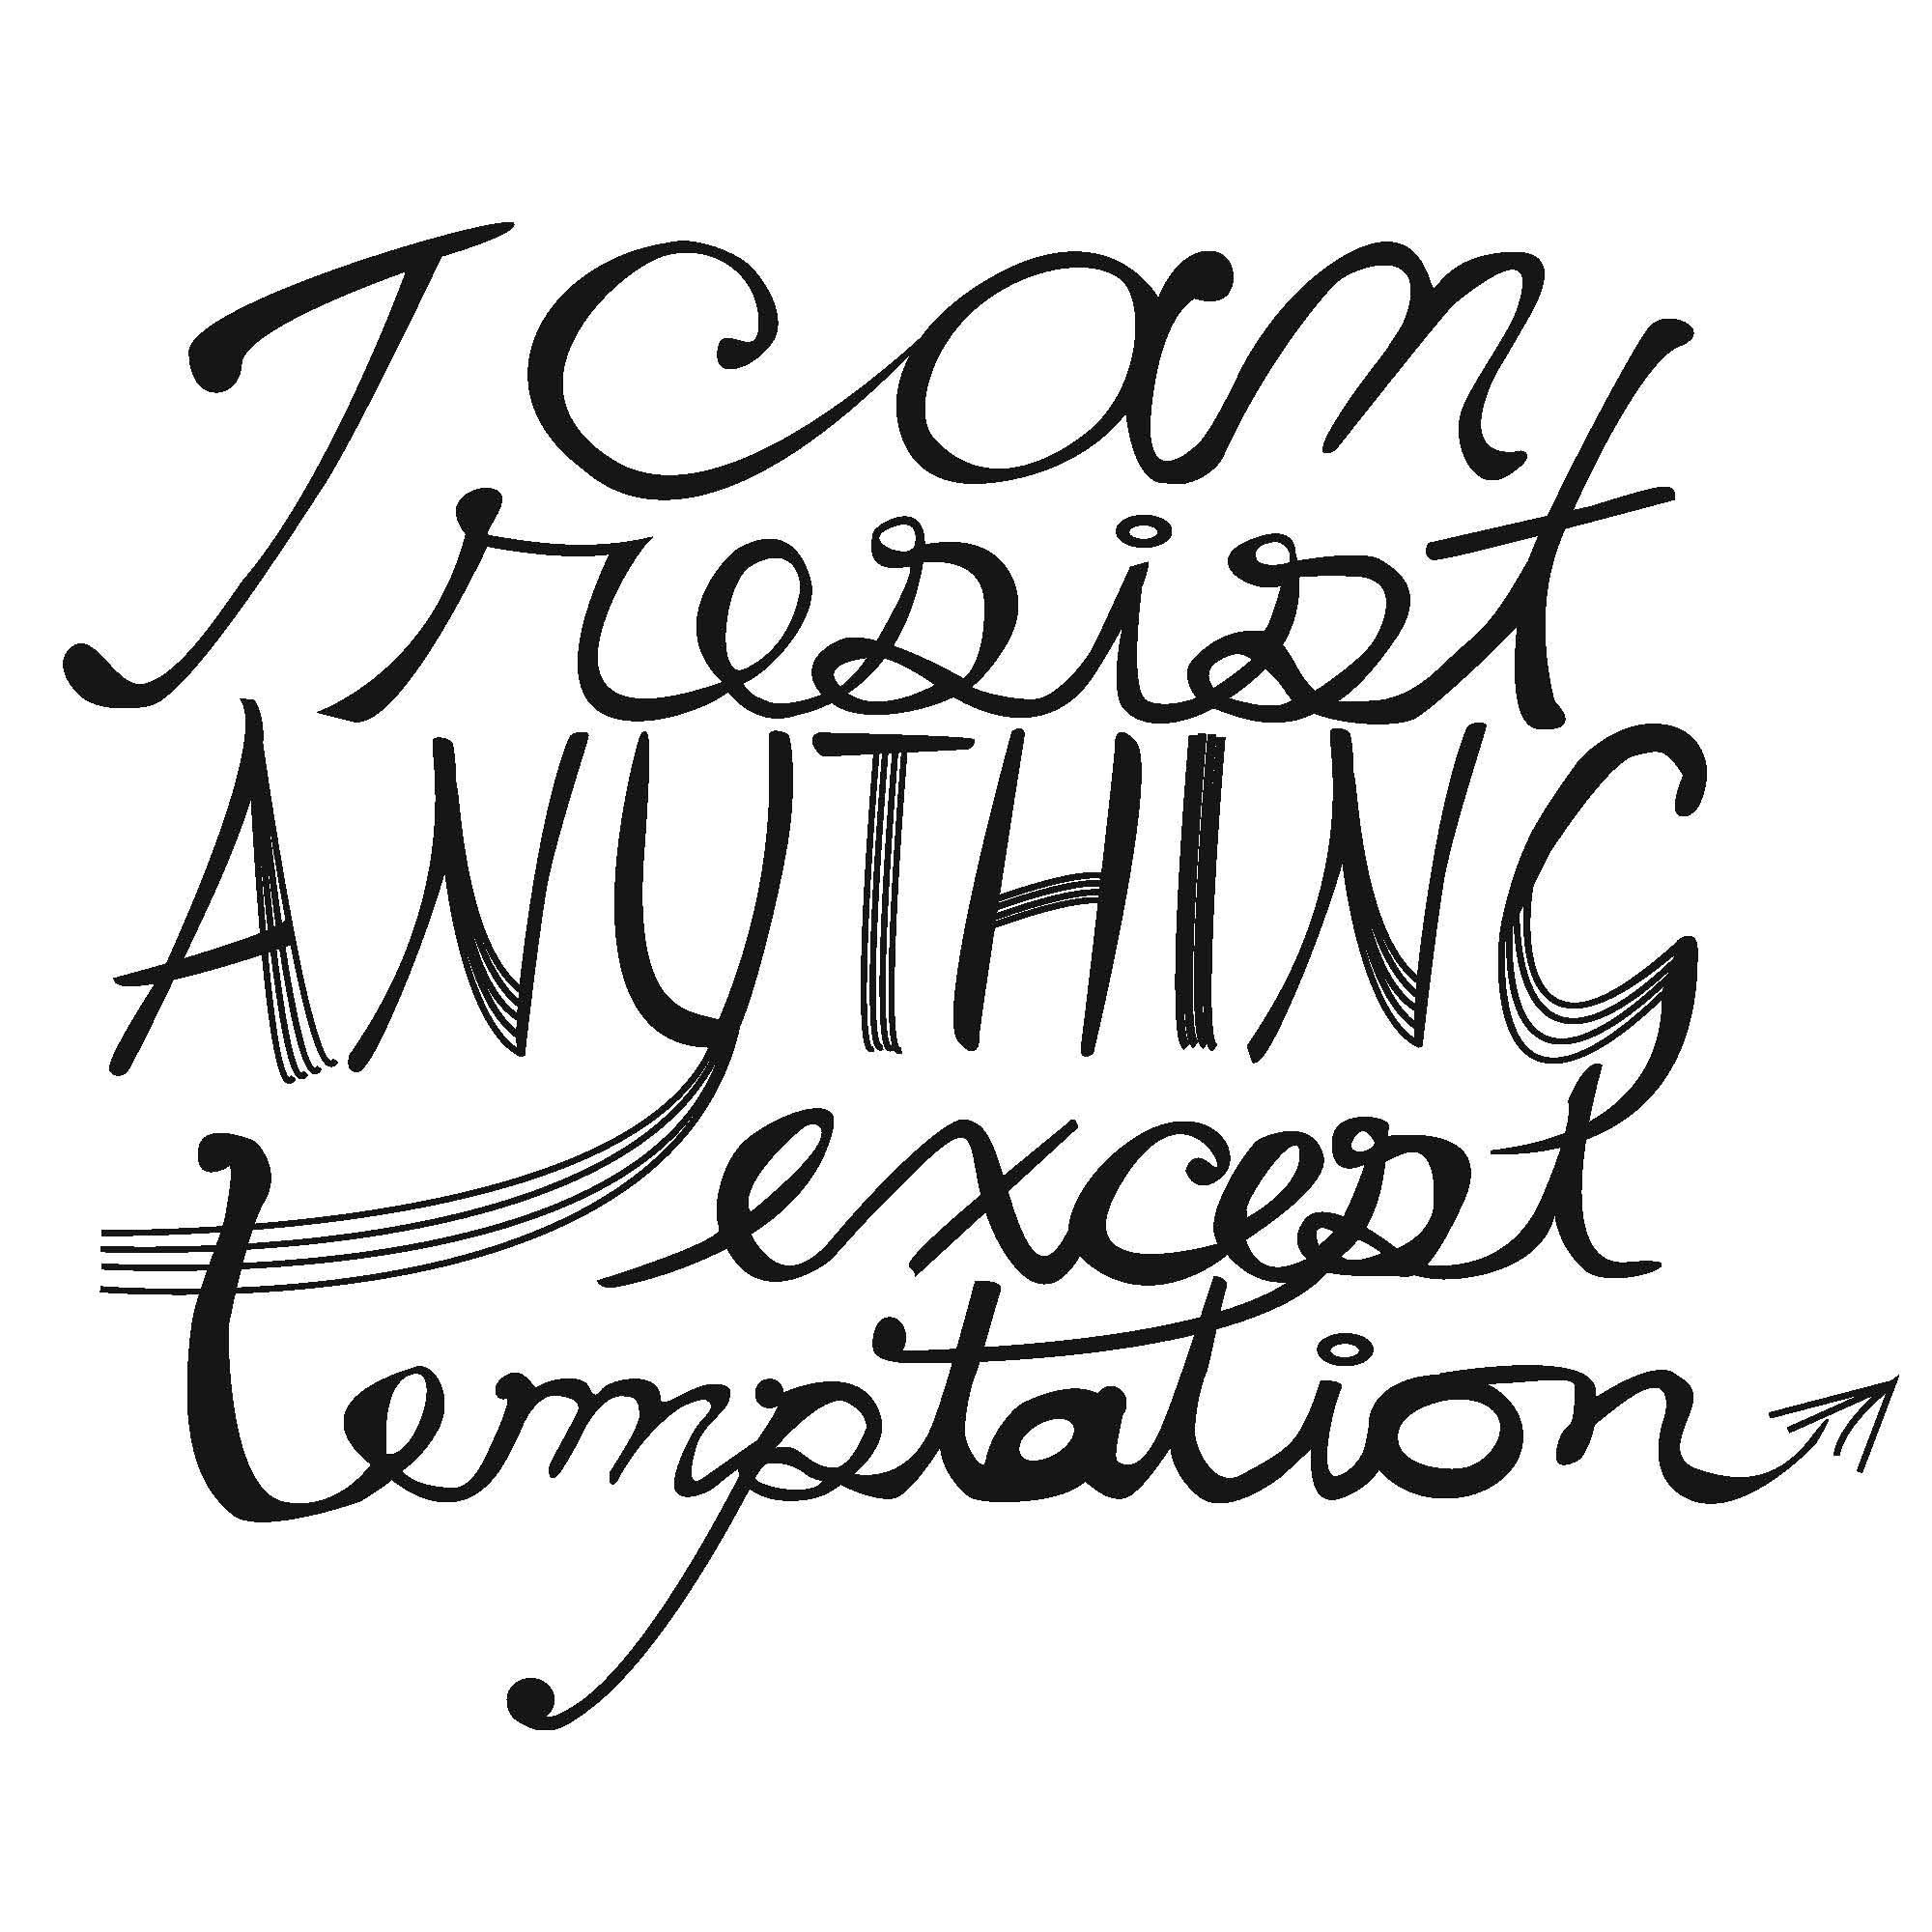 Temptation - image 2 - student project